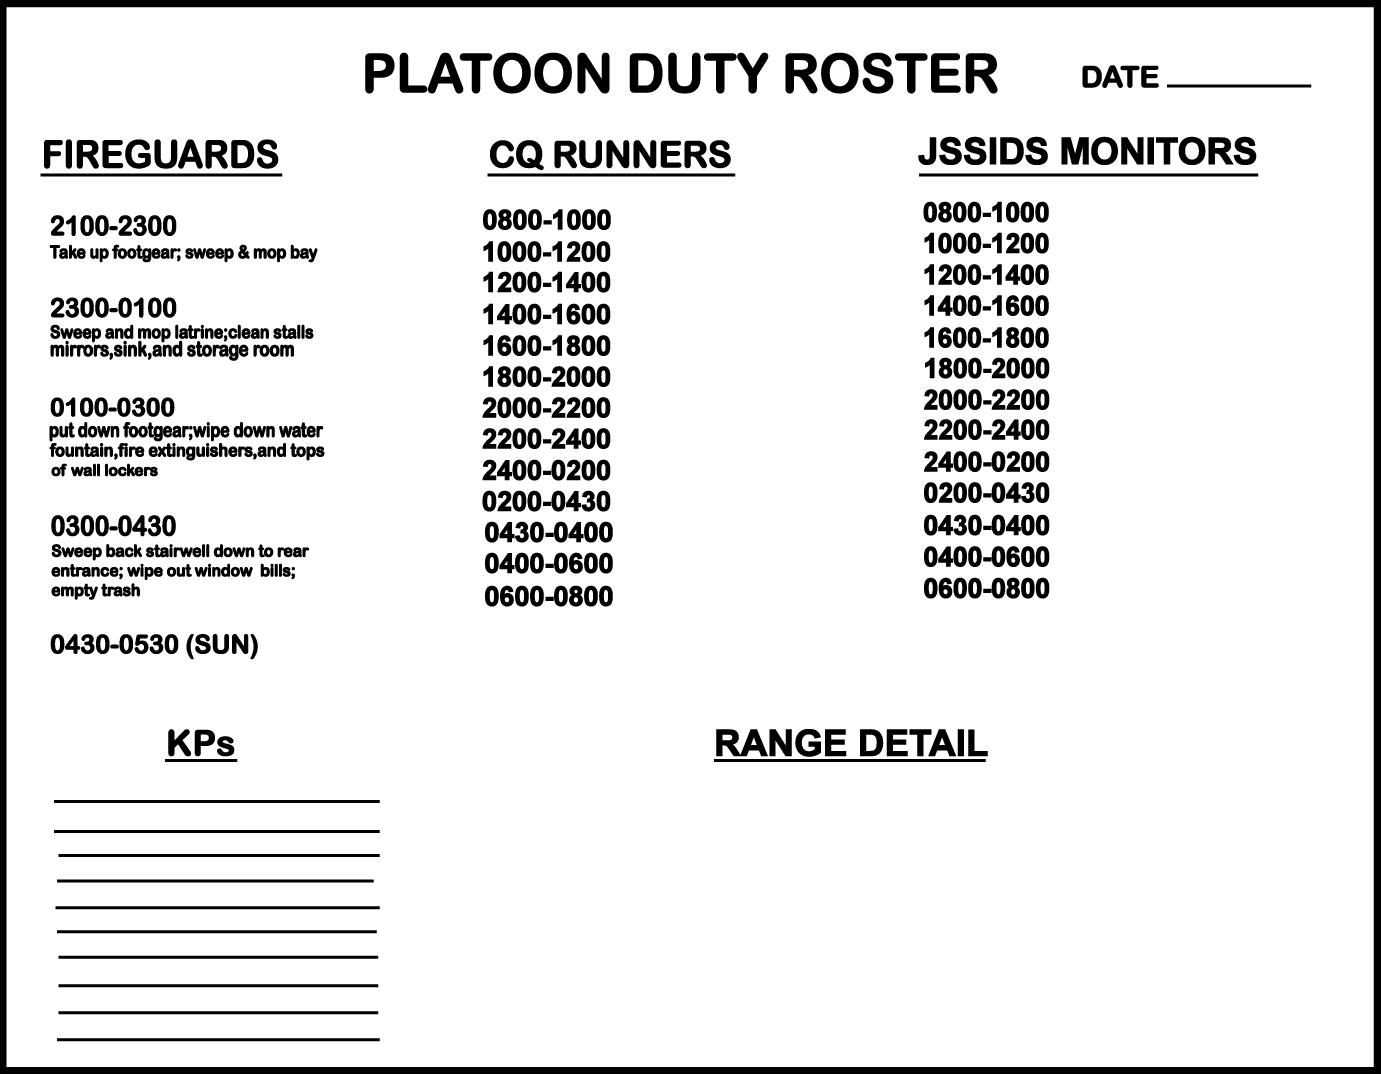 mc 0000 0000 00059 platoon duty roster ma 53 50 00 army training